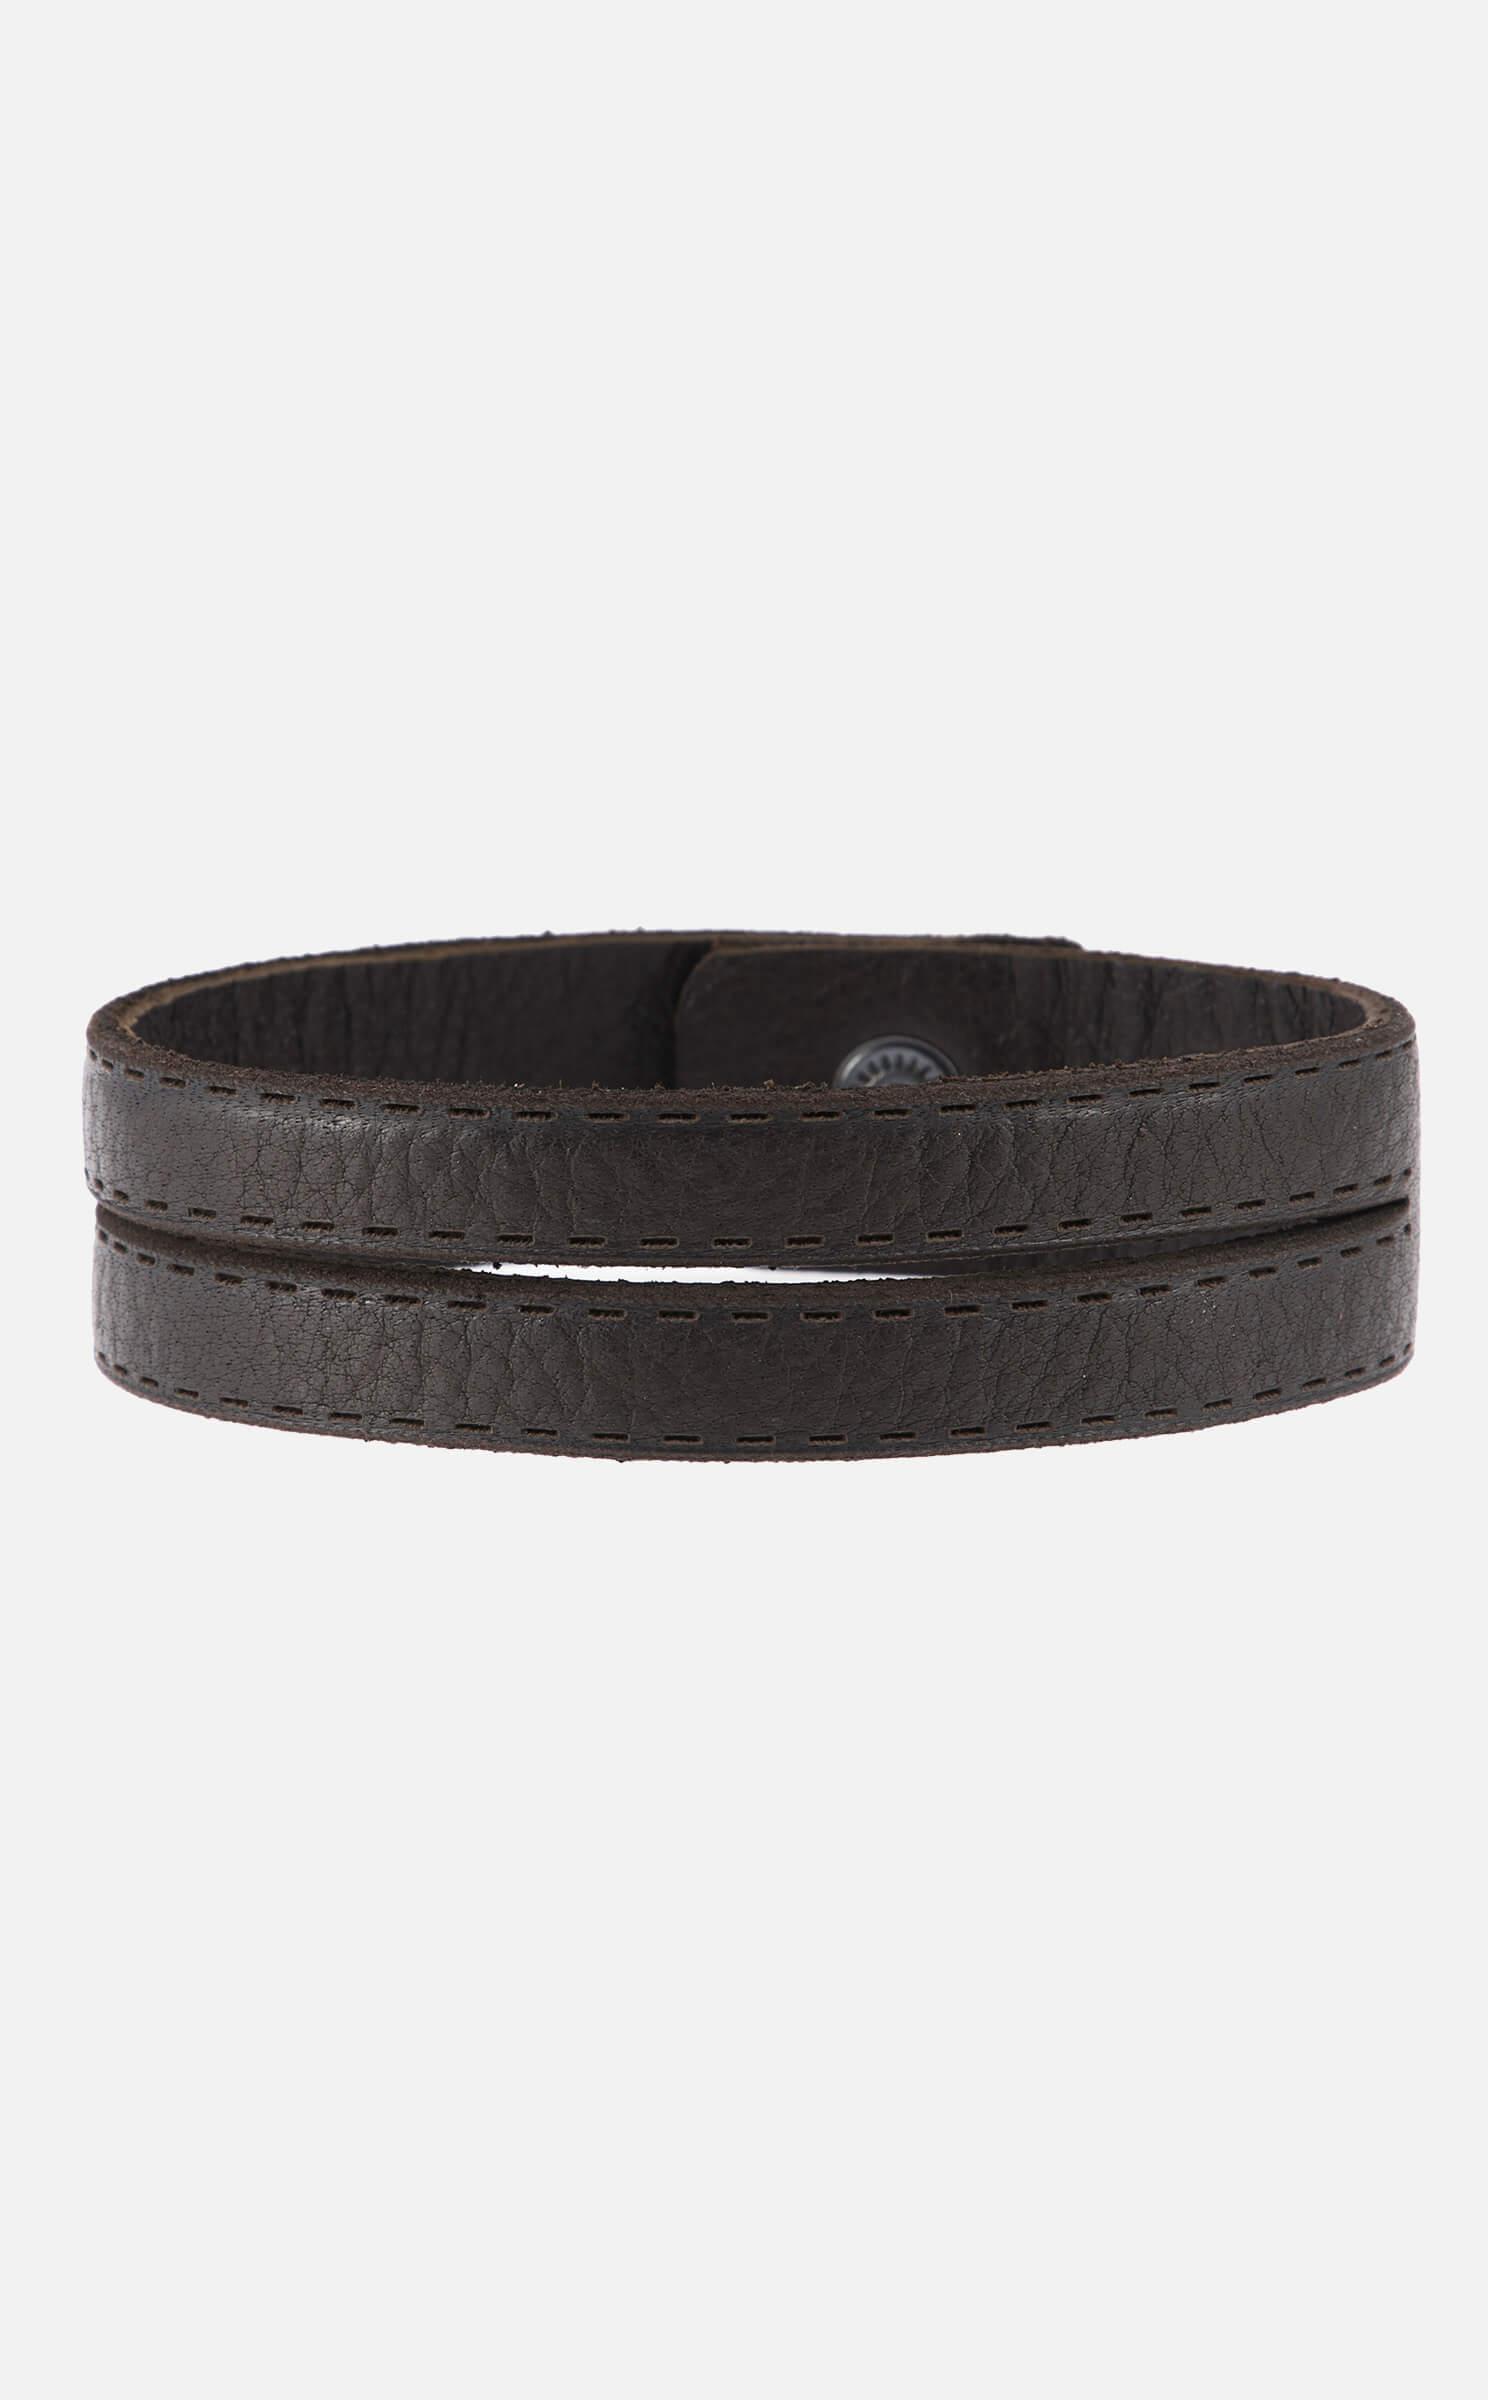 Armband | Echtleder | braun